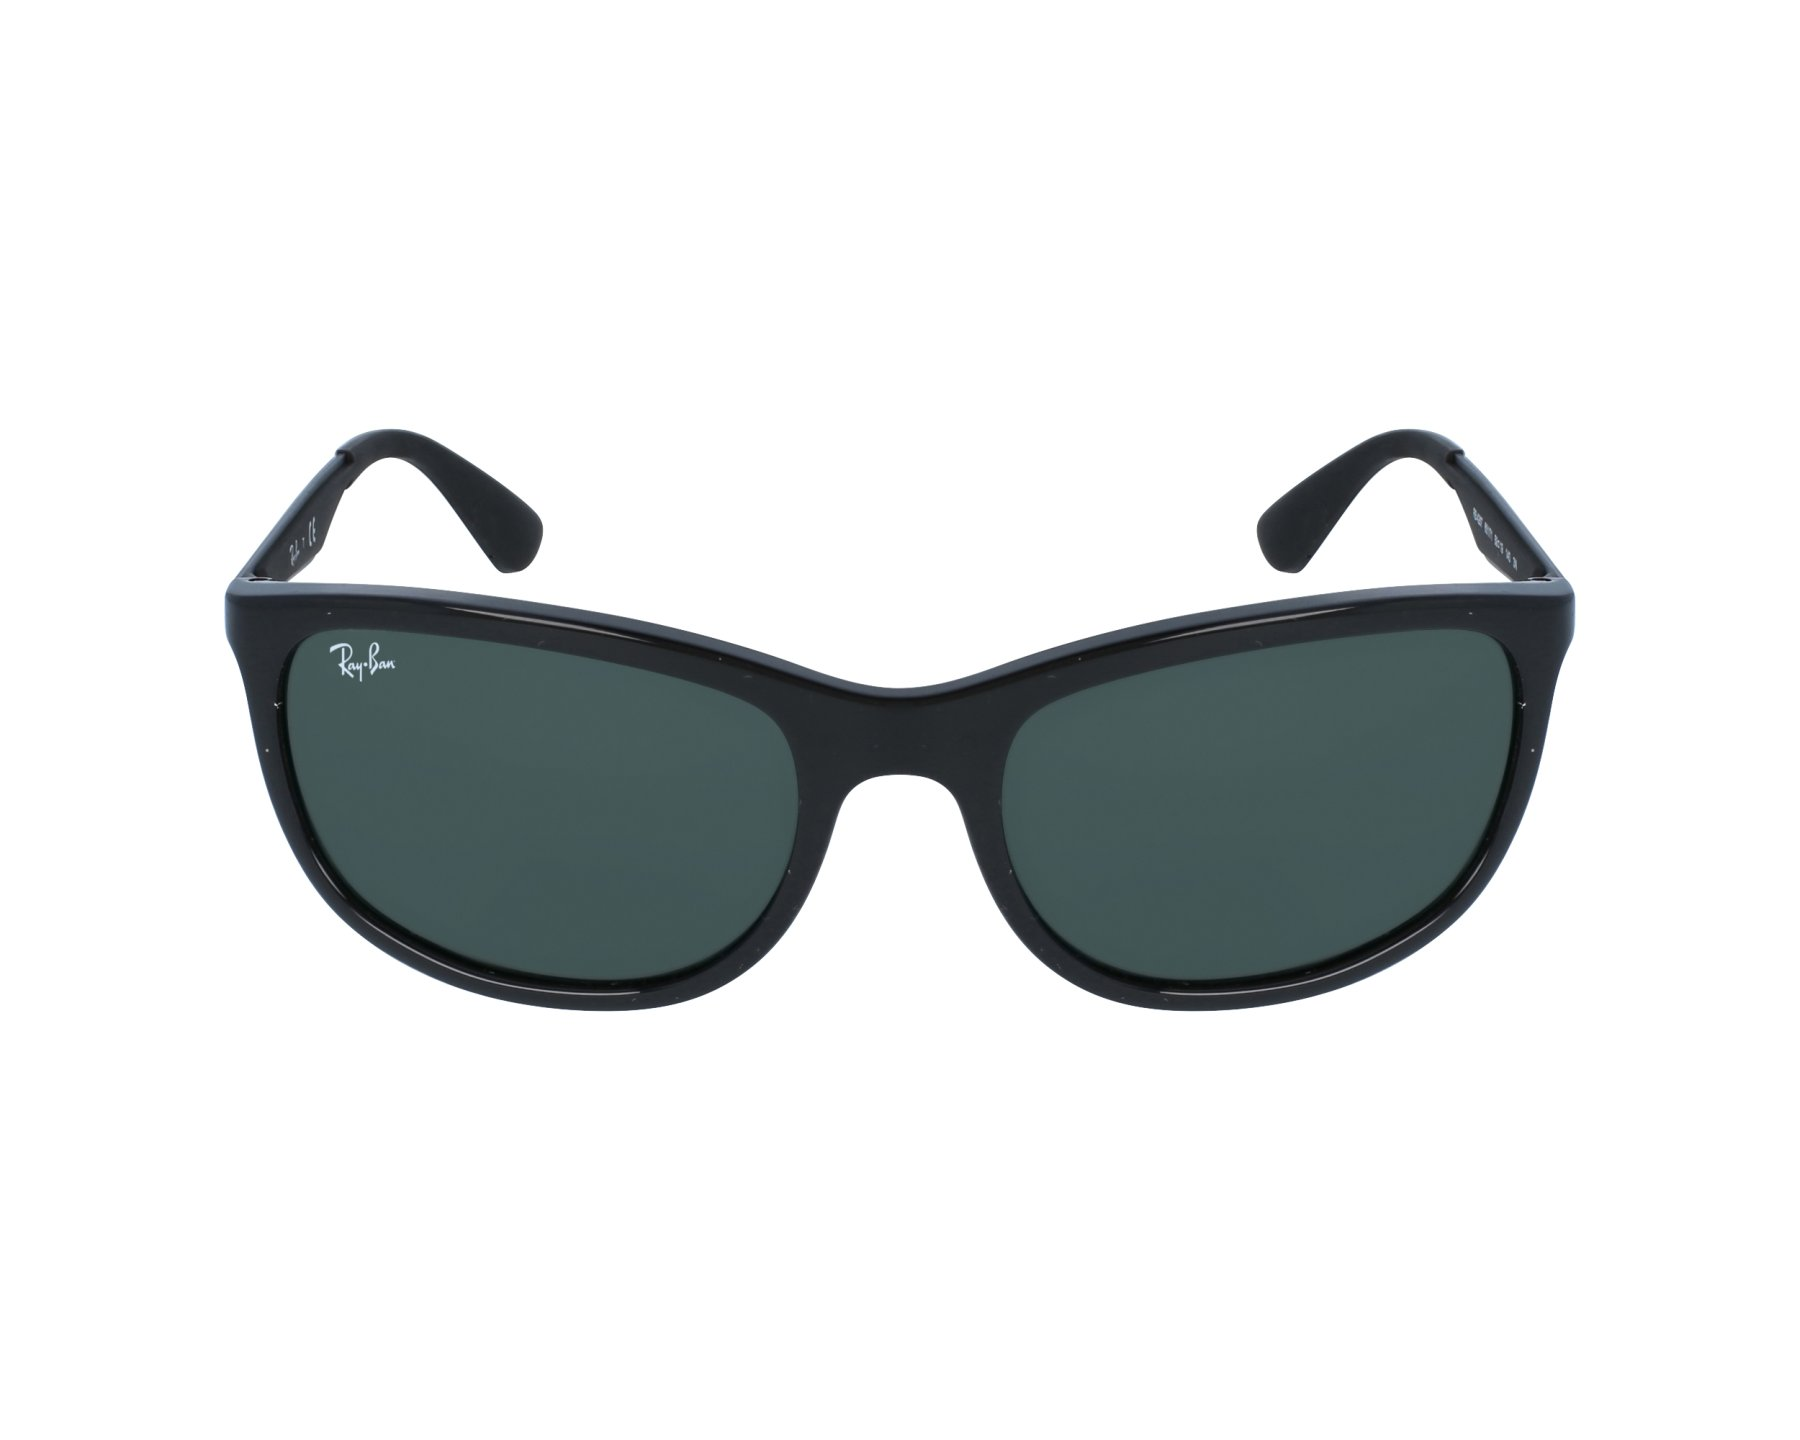 ae7656a5260 Sunglasses Ray-Ban RB-4267 601 71 59-19 Black Black profile